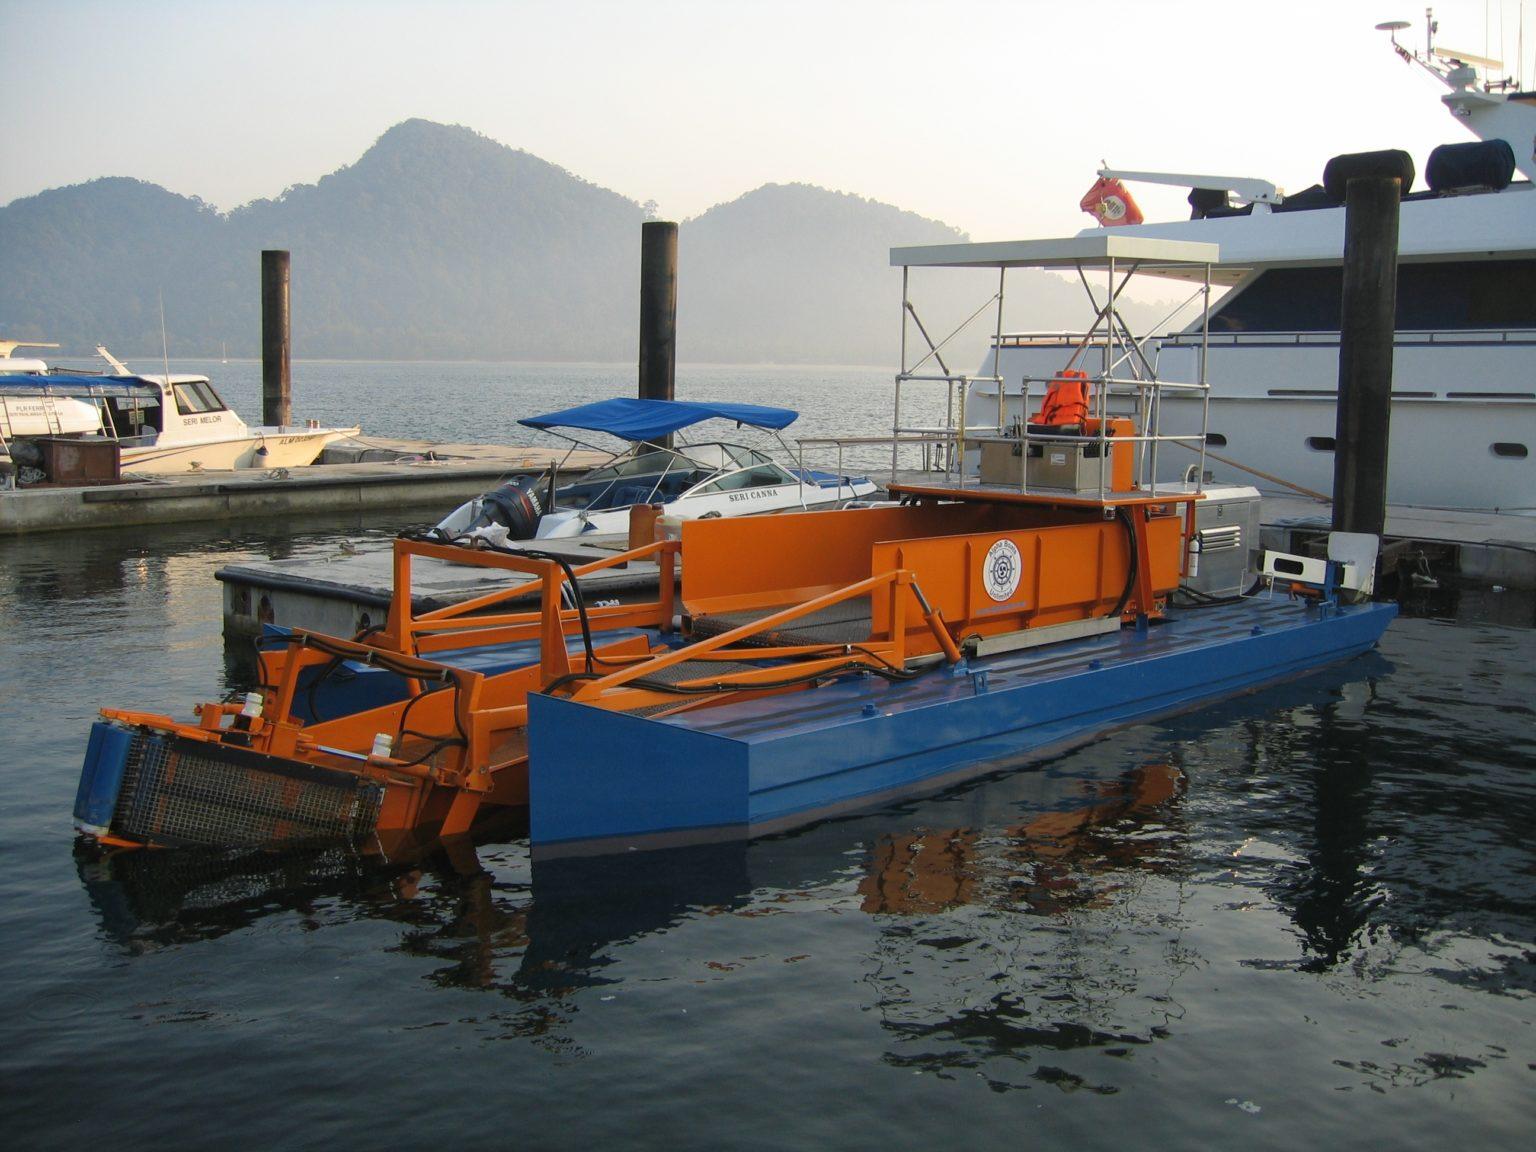 MC 202 Pontoon at dock